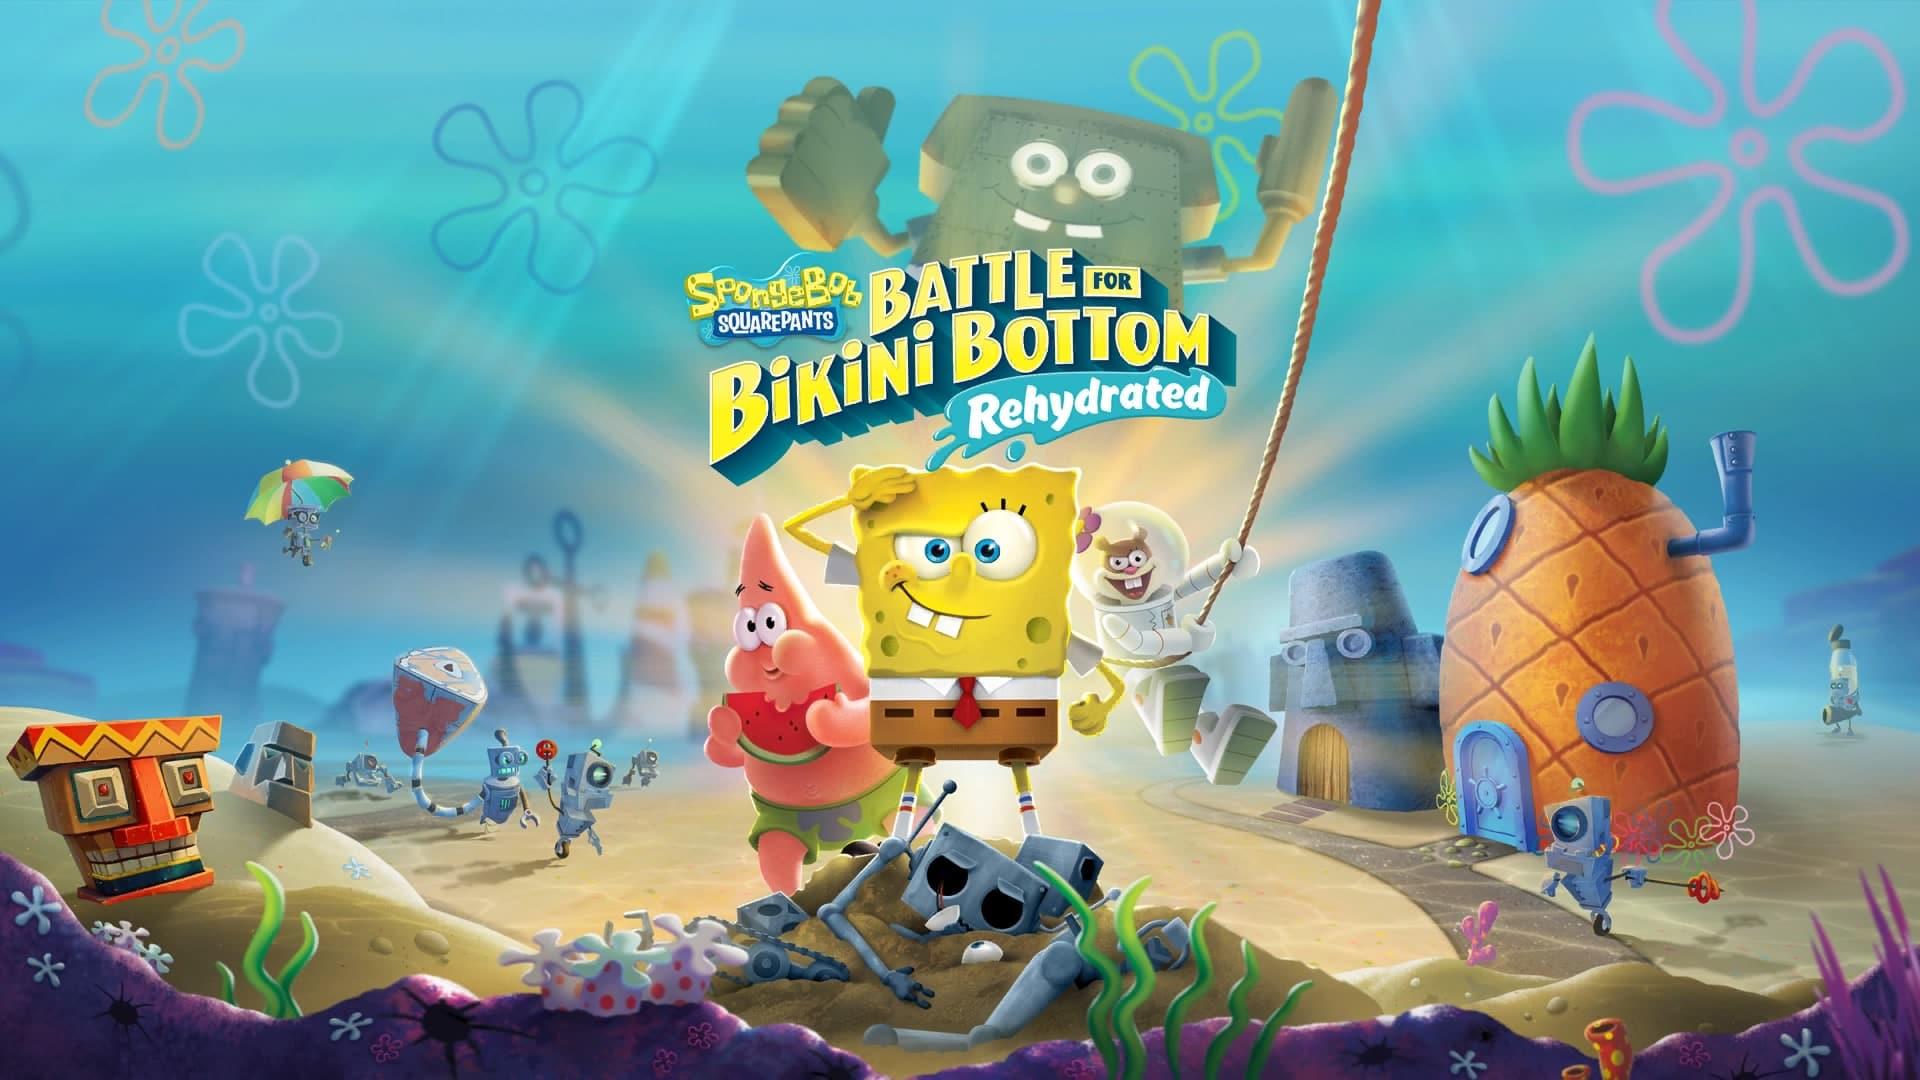 SpongeBob SquarePants: Battle for Bikini Bottom - Rehydrated Review